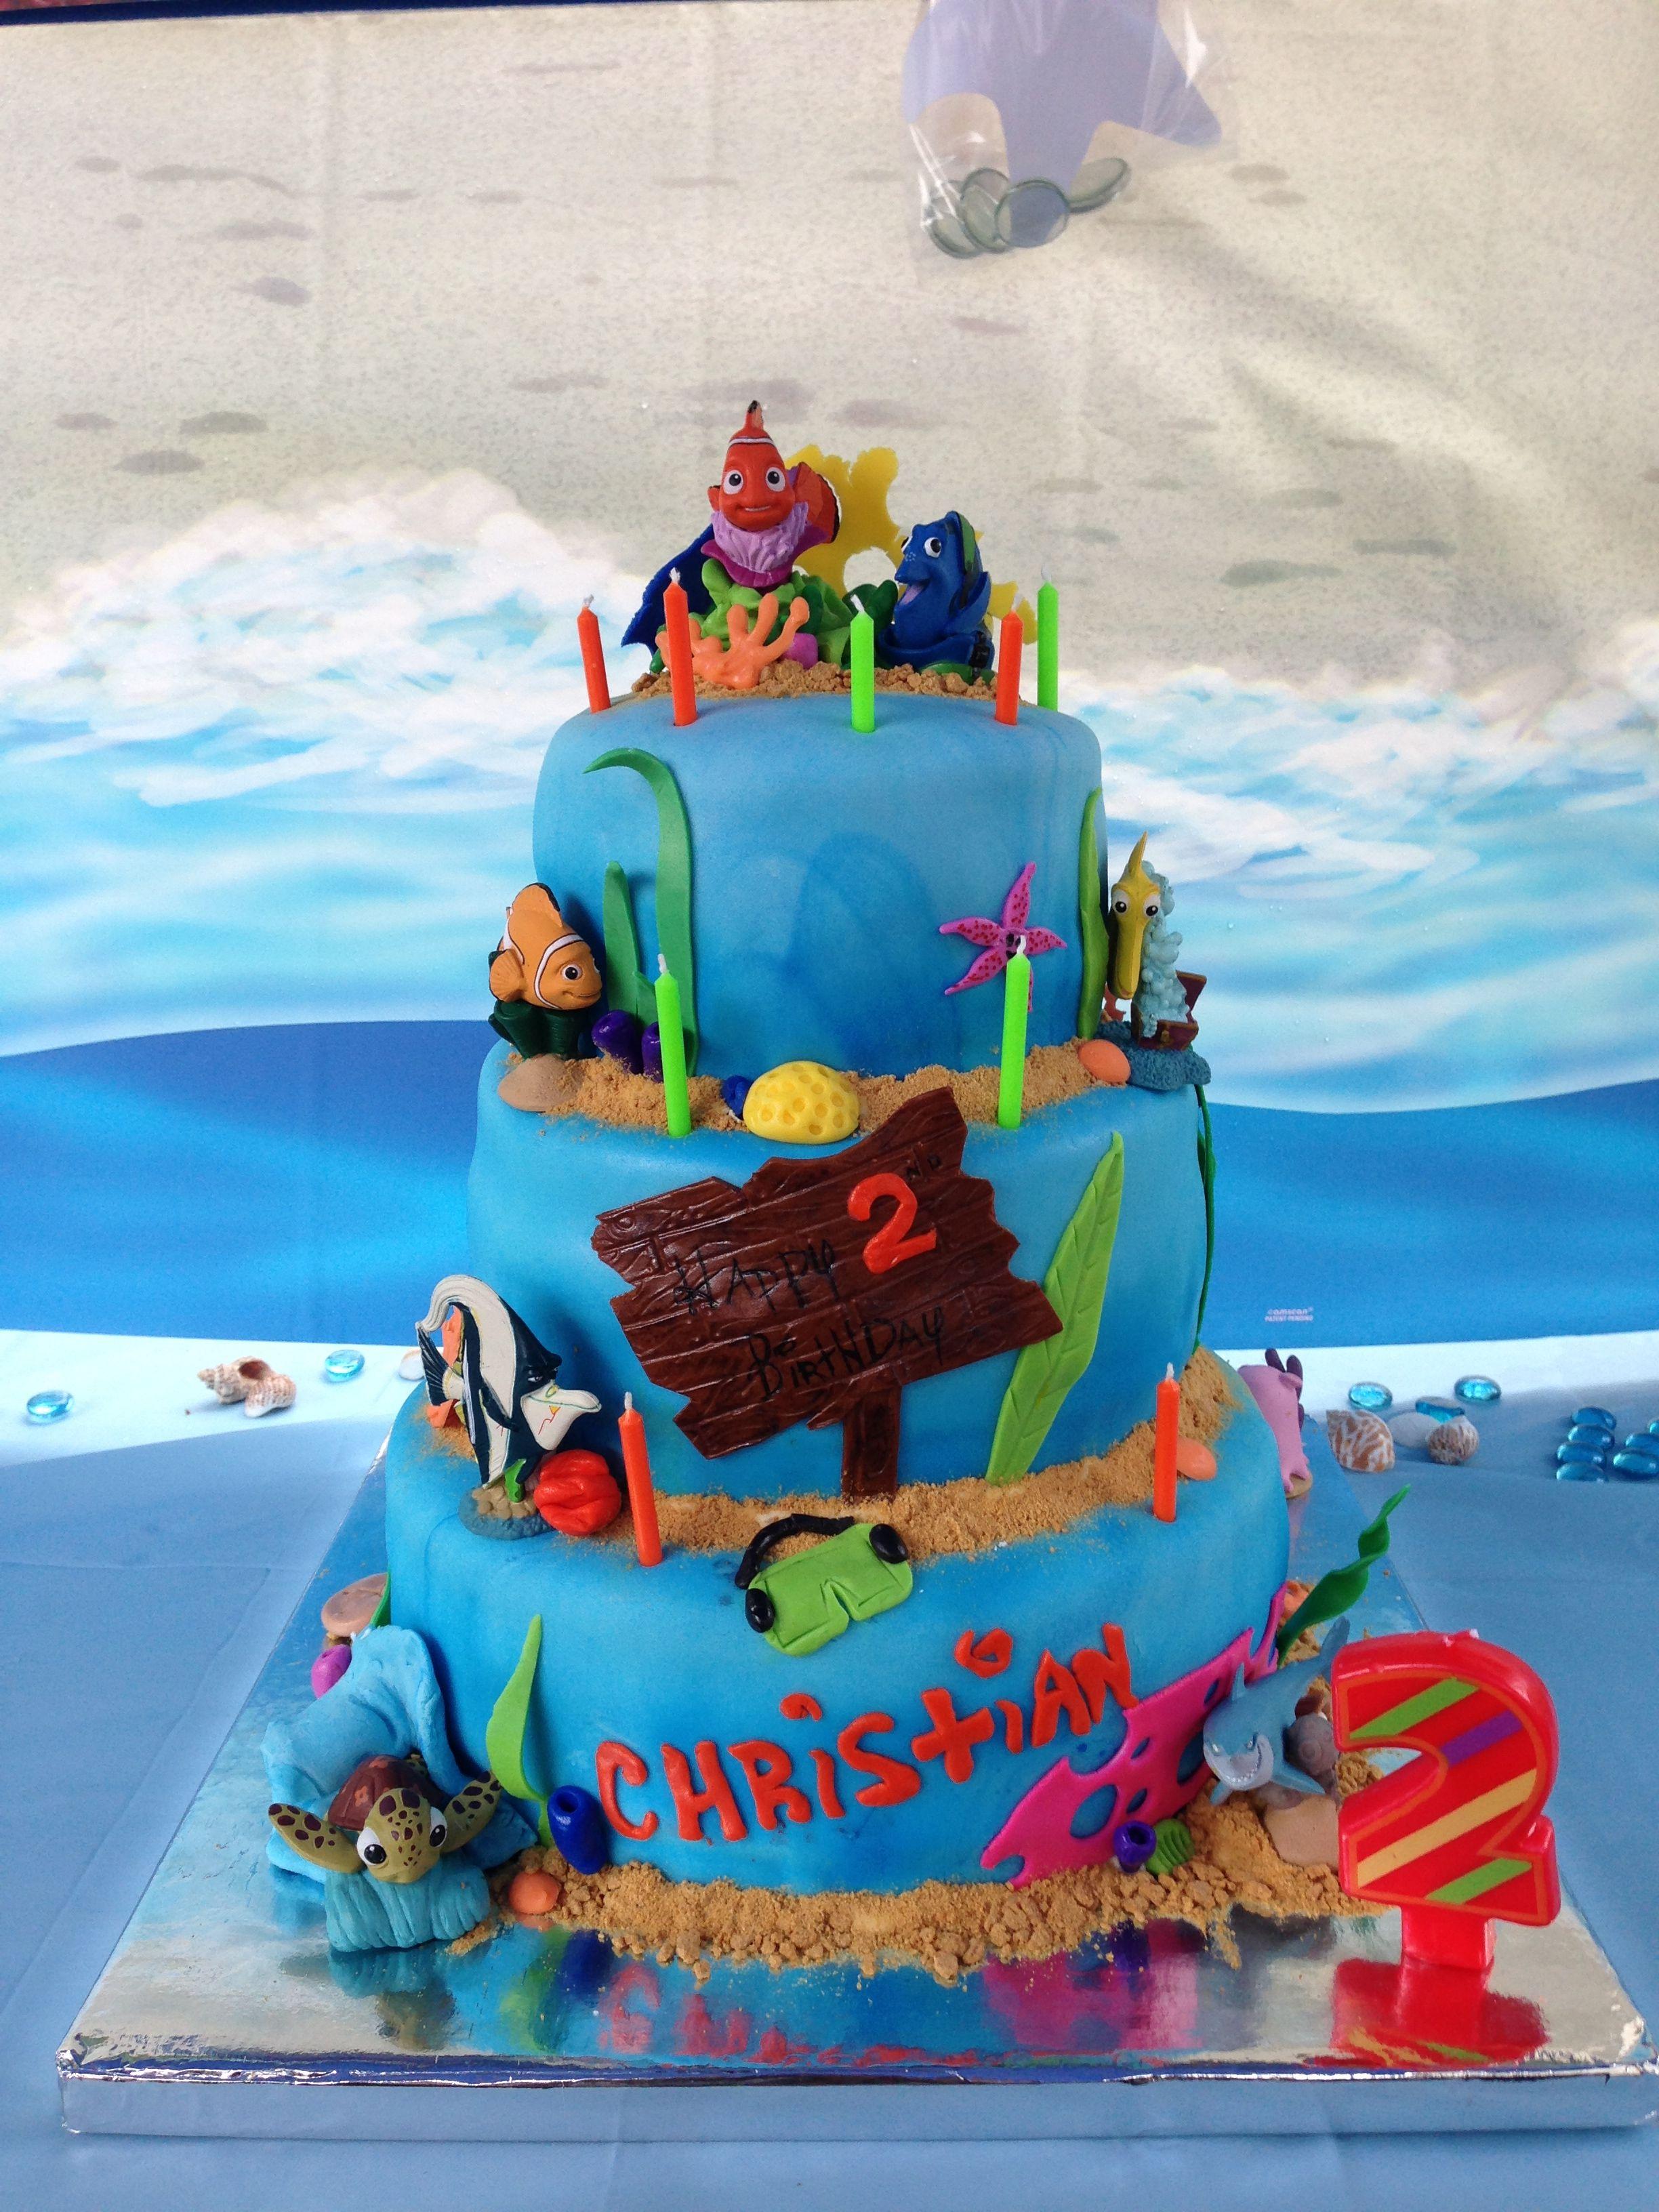 Christian's 2nd Birthday Finding Nemo Cake